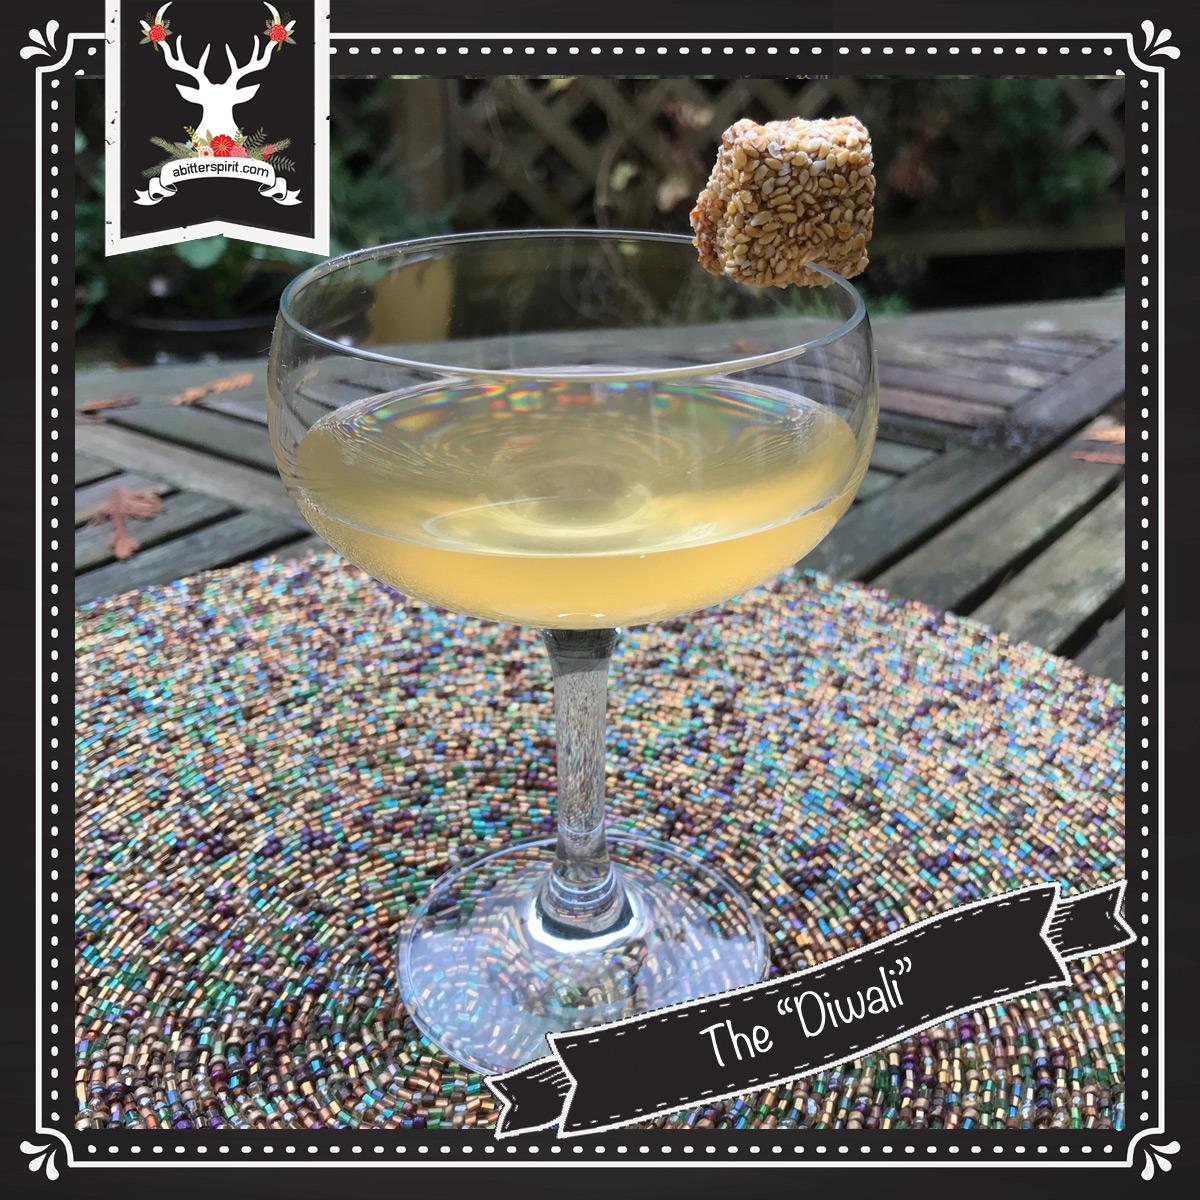 The 'Diwali' Cocktail - ABitterSpirit.com